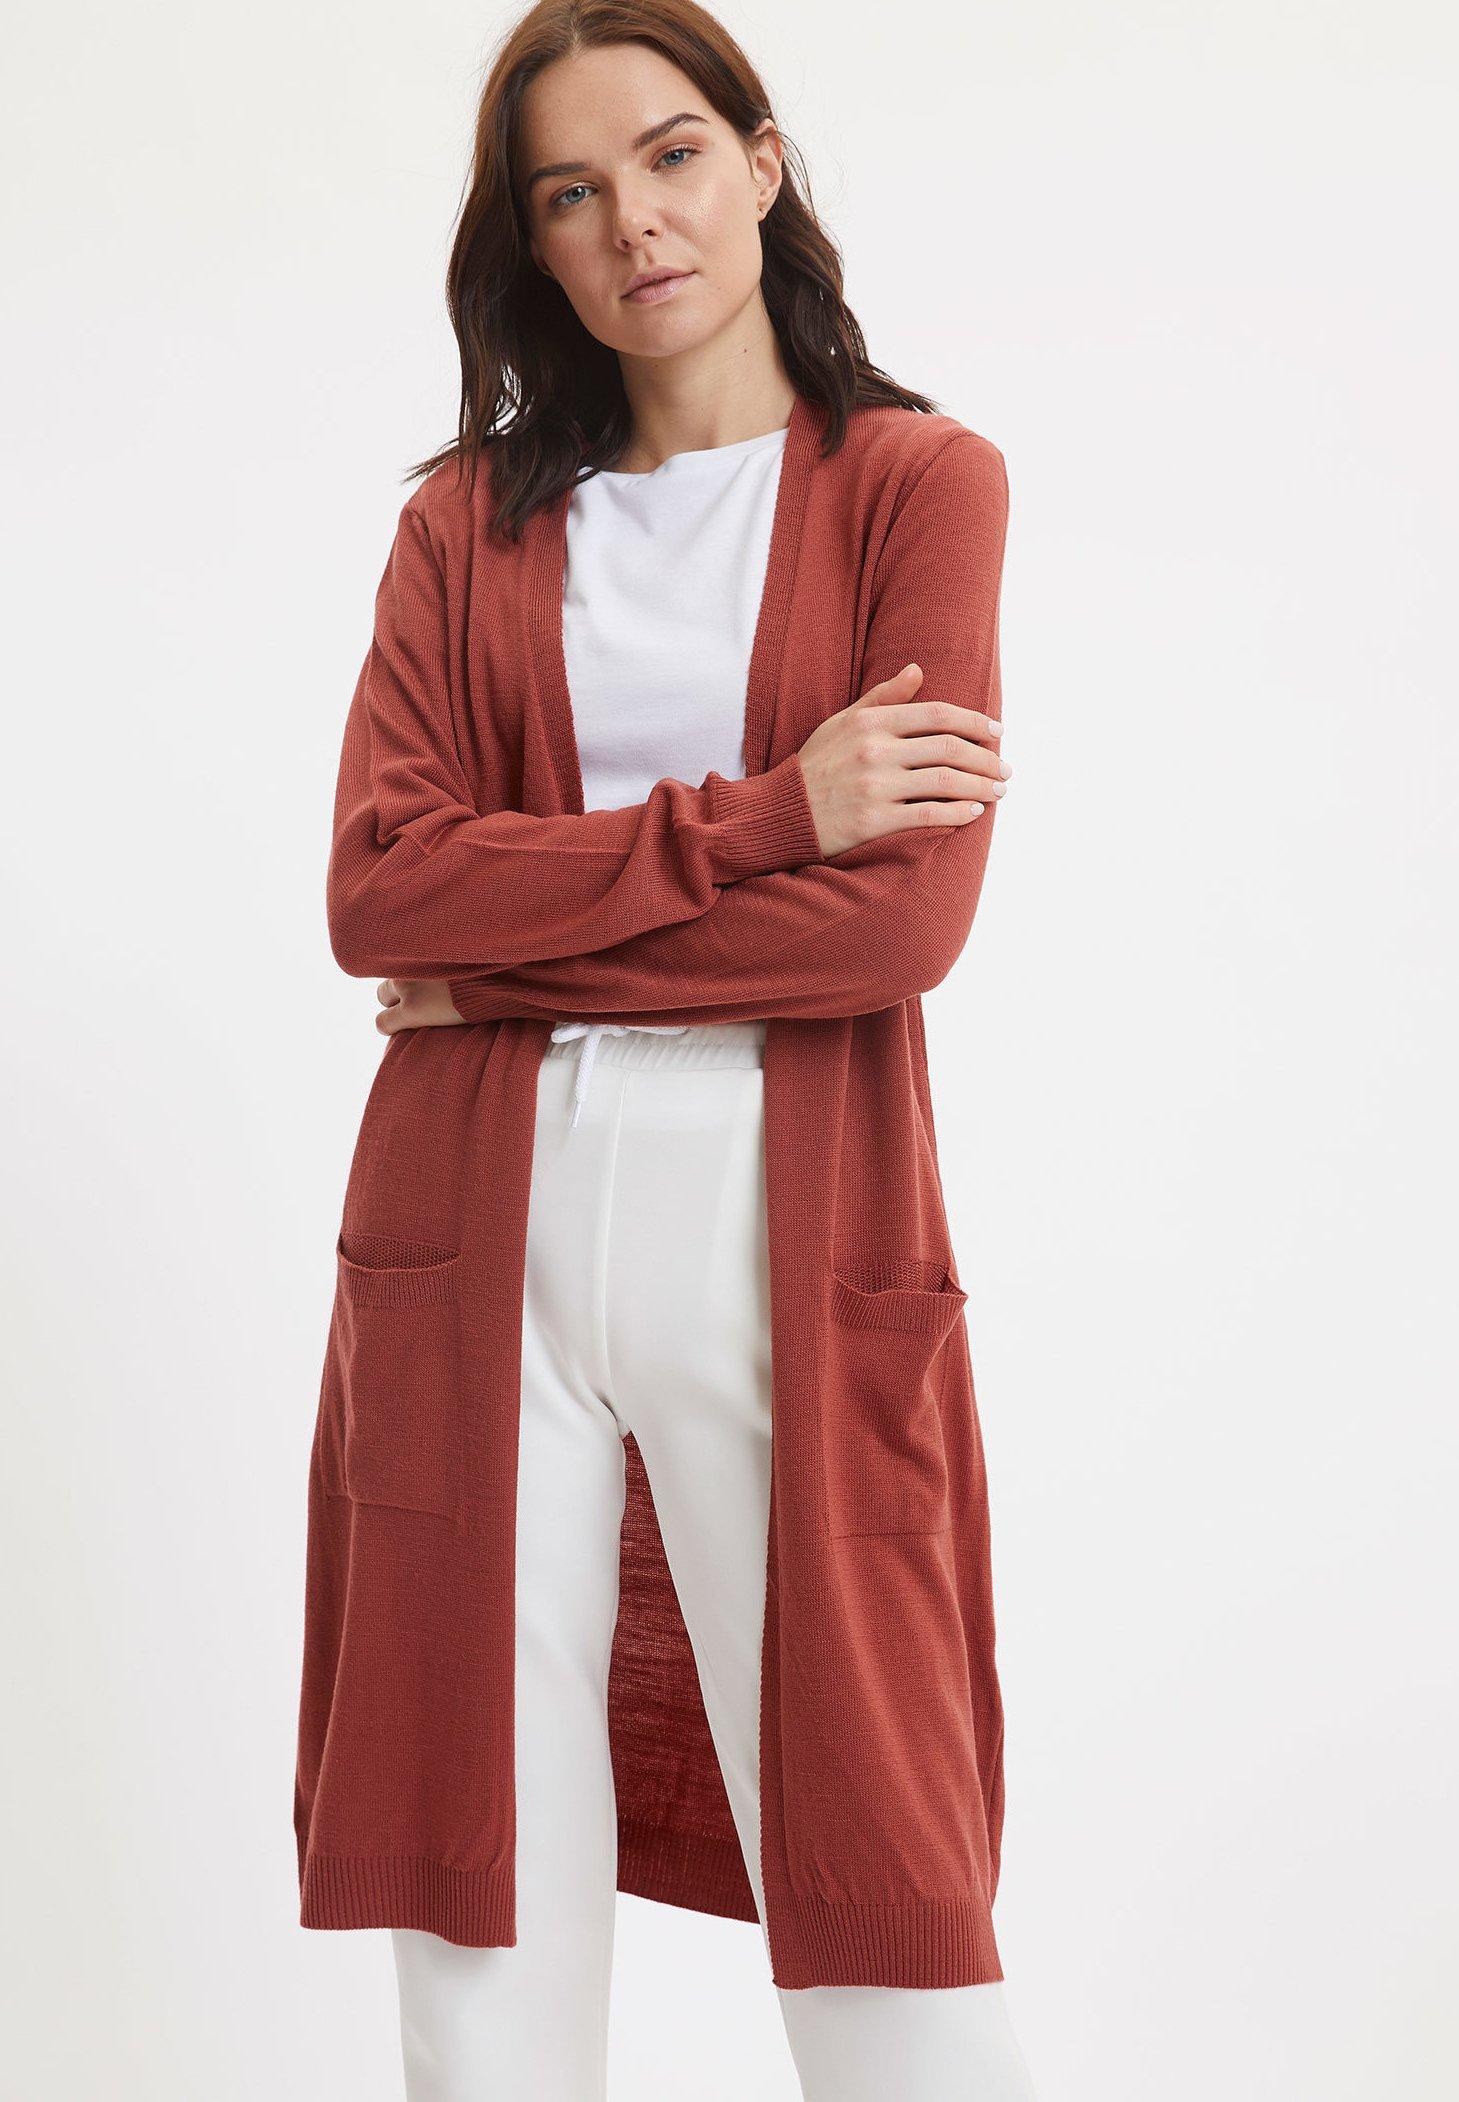 comprar chaqueta punto mujer granate roja